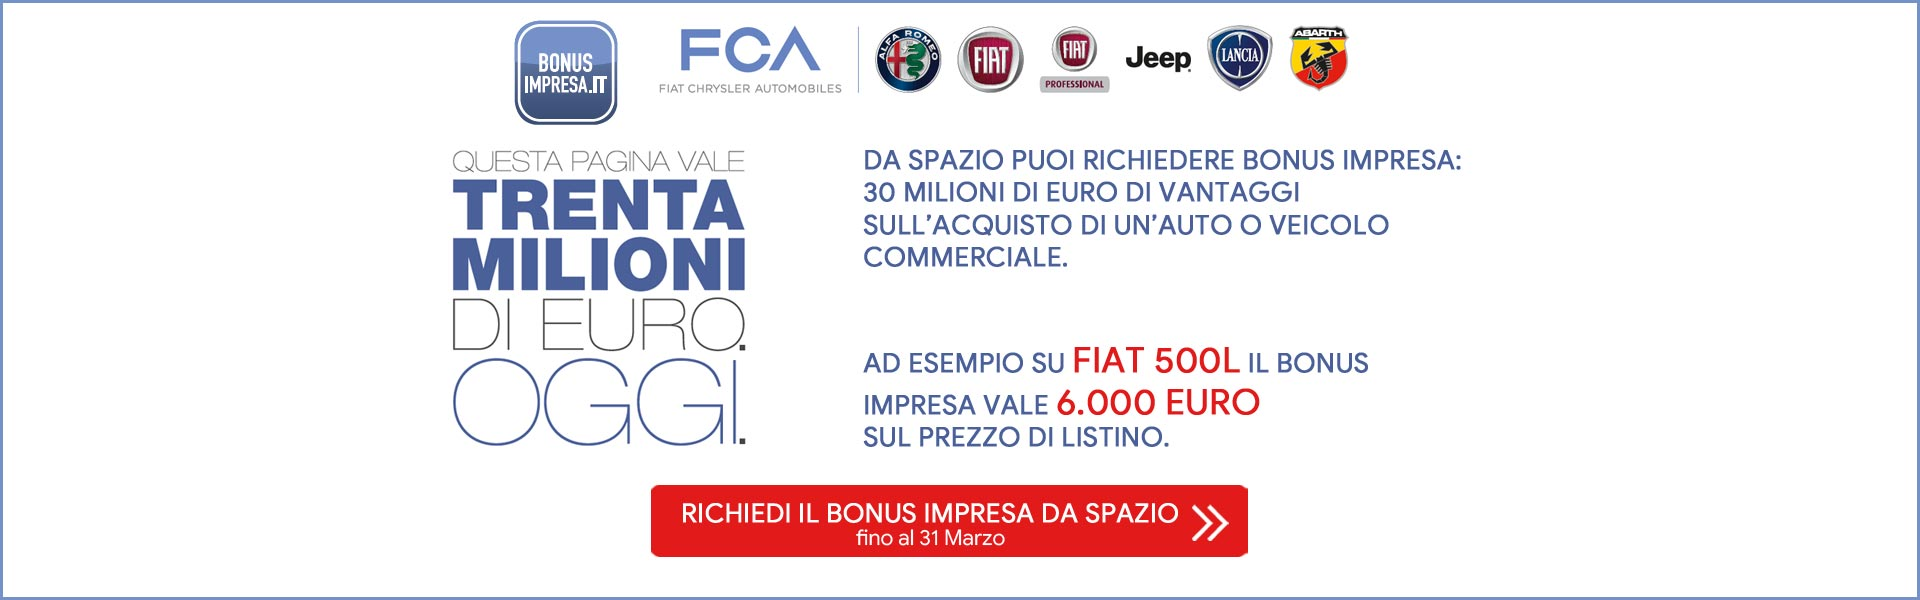 Bonus Impresa su Fiat 500 L